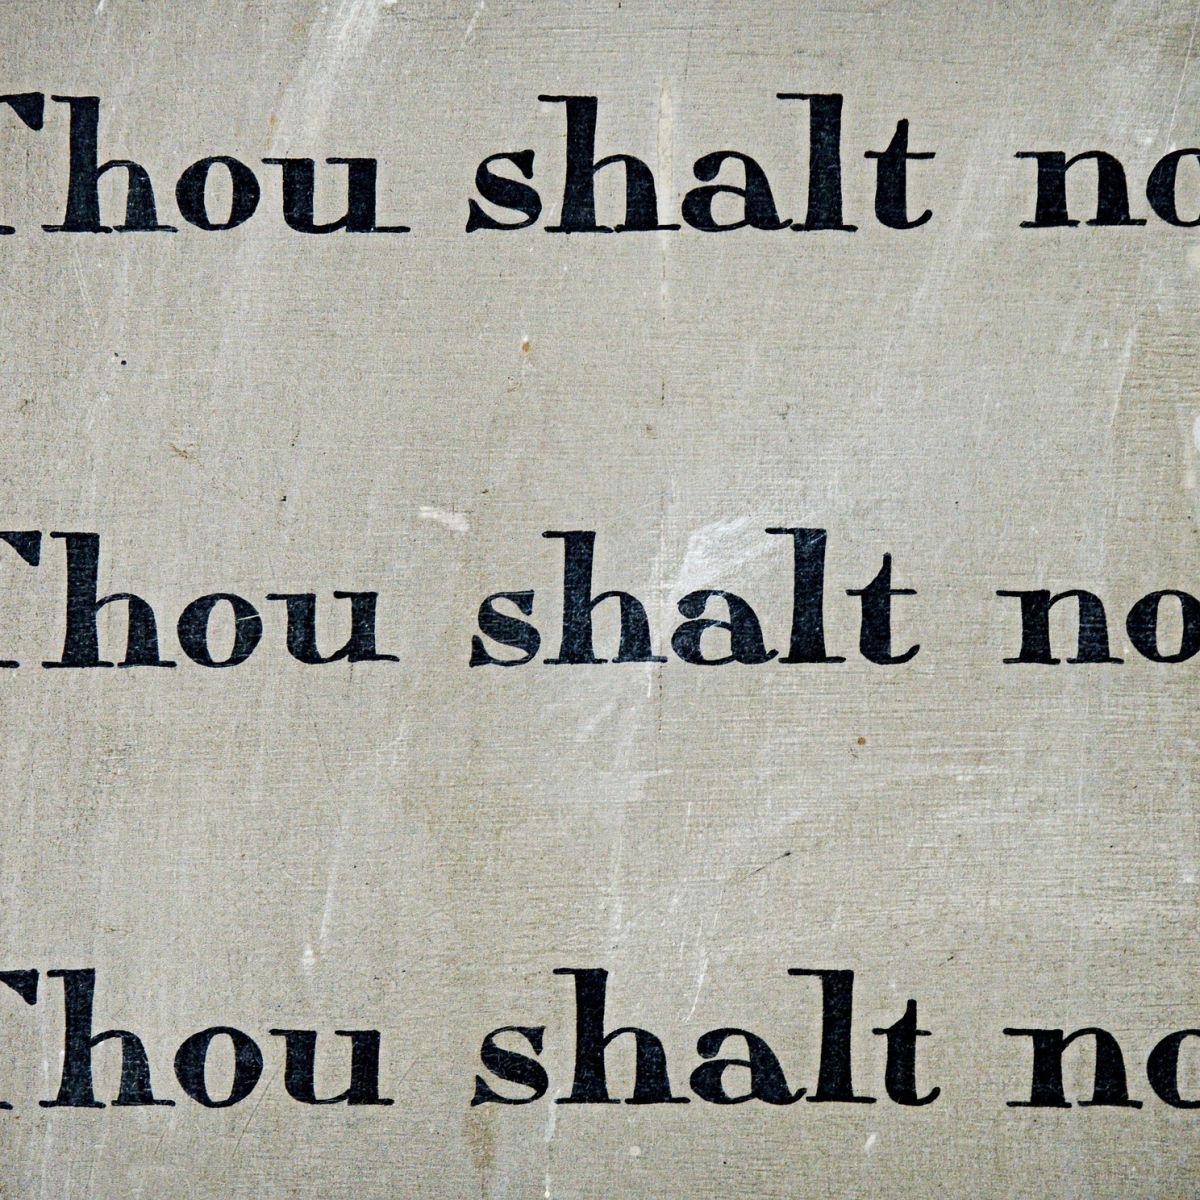 Thou shalt not - commandement - guilt - rules